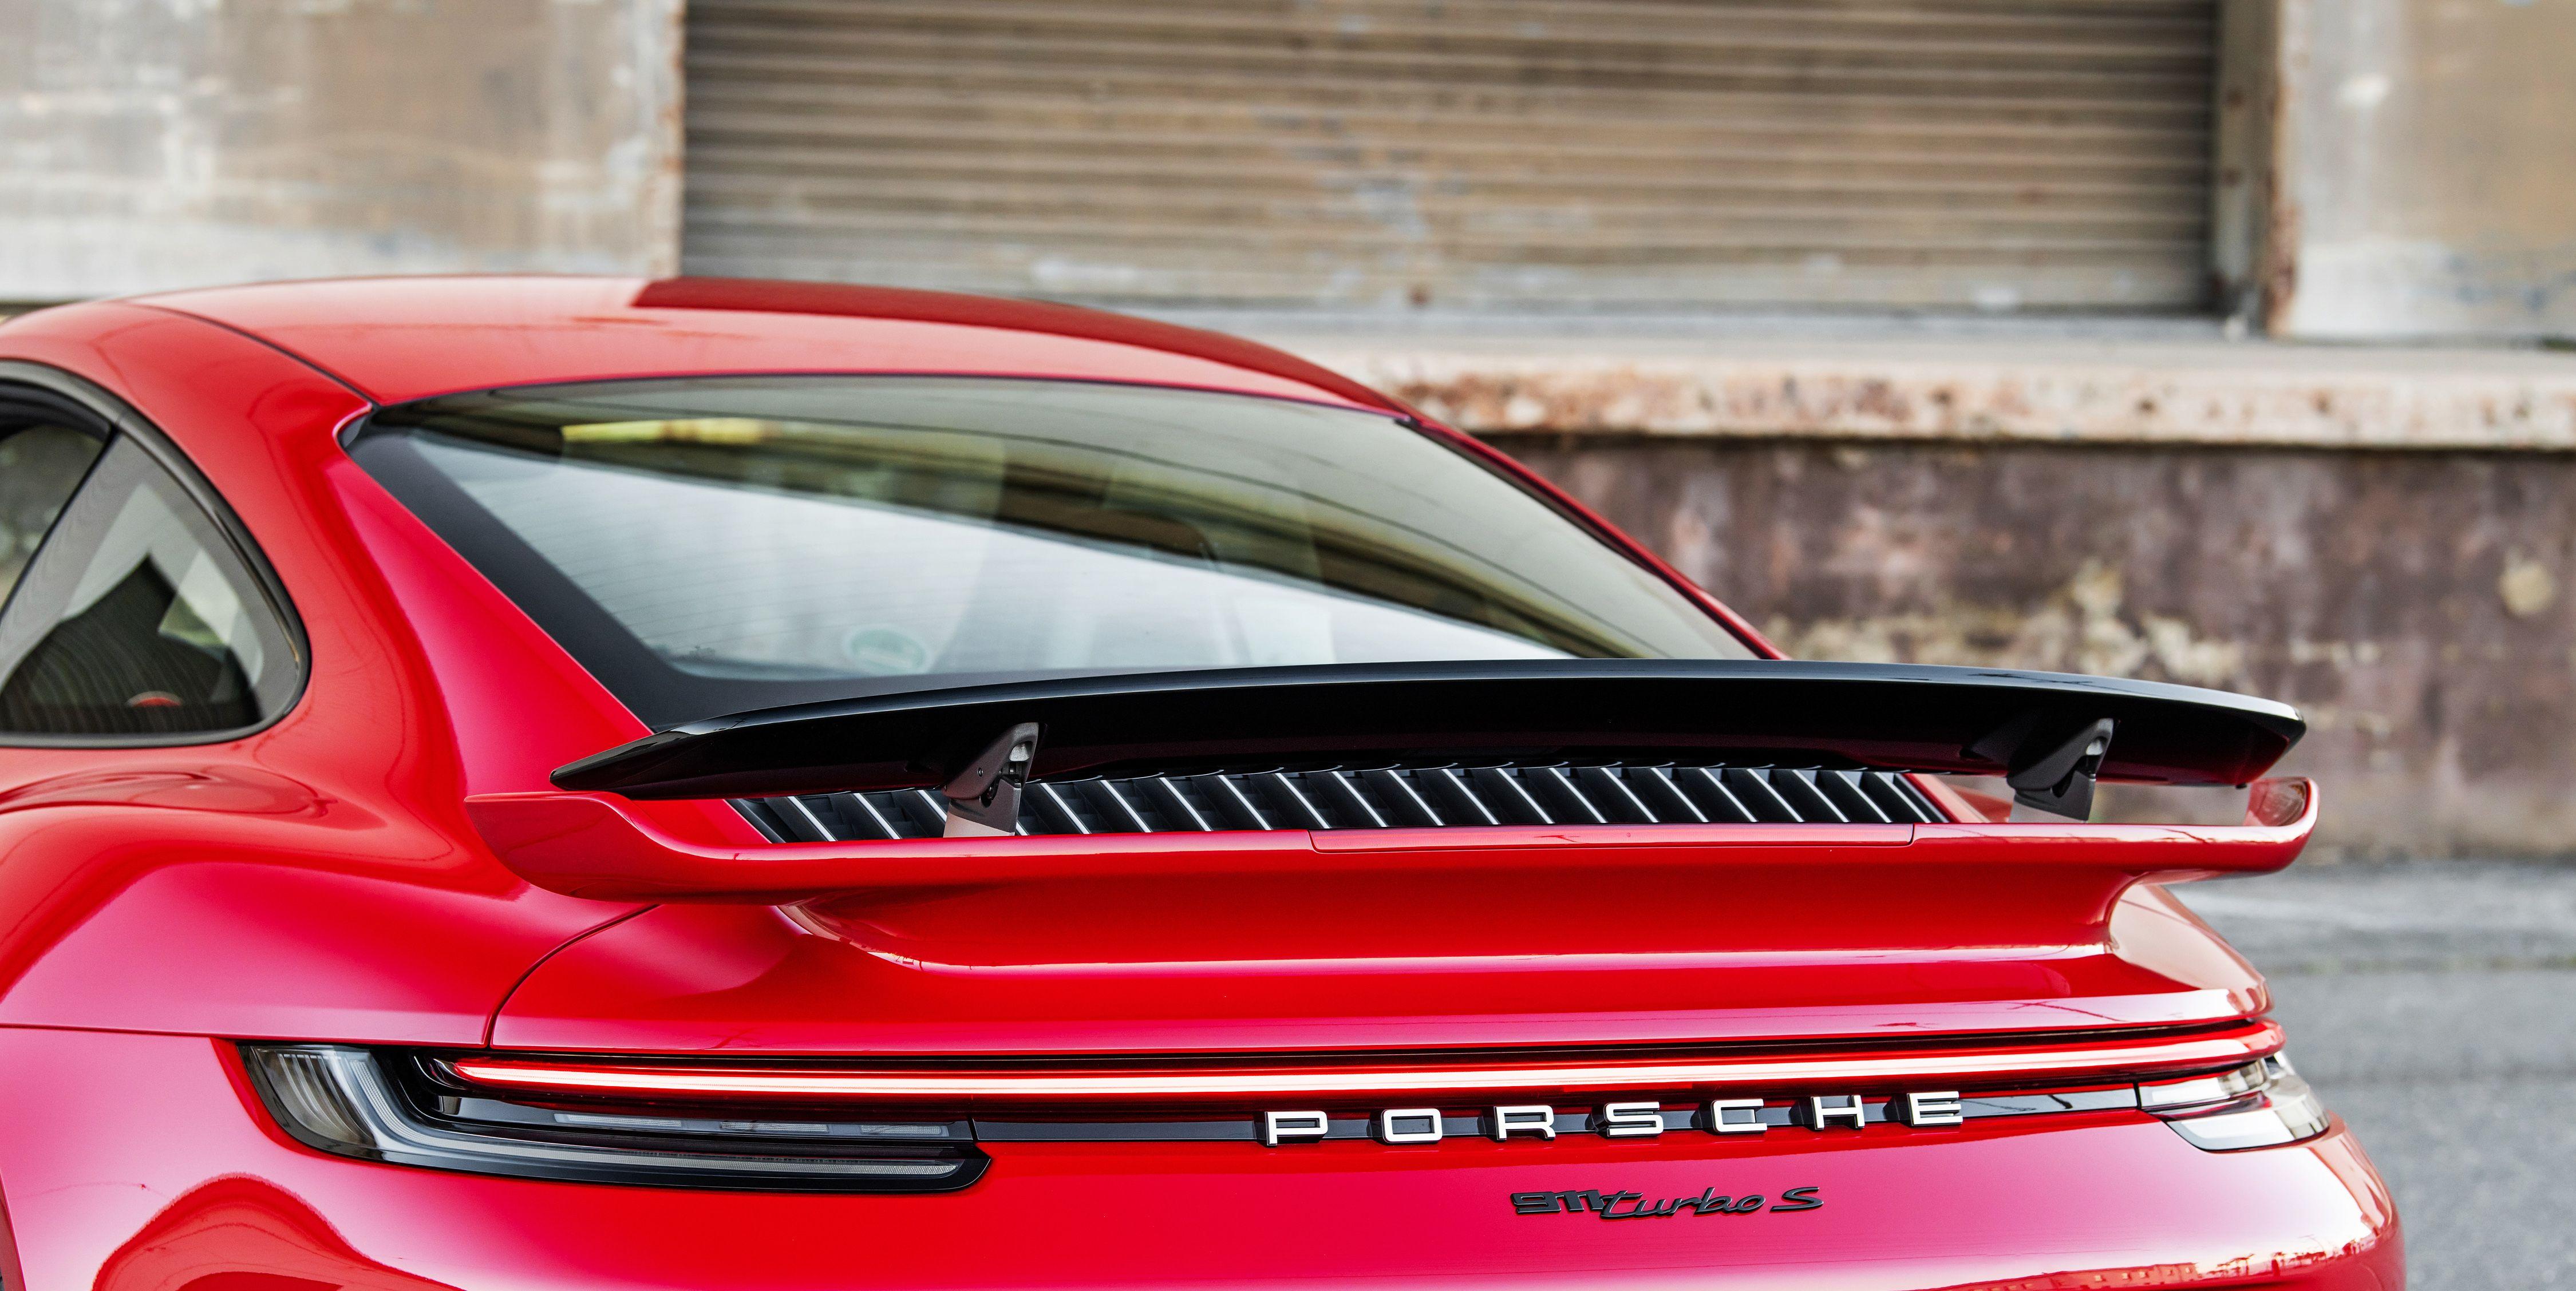 Porsche 911 Turbo S Has an Air-Brake Function in Its Adjustable Aerodynamics